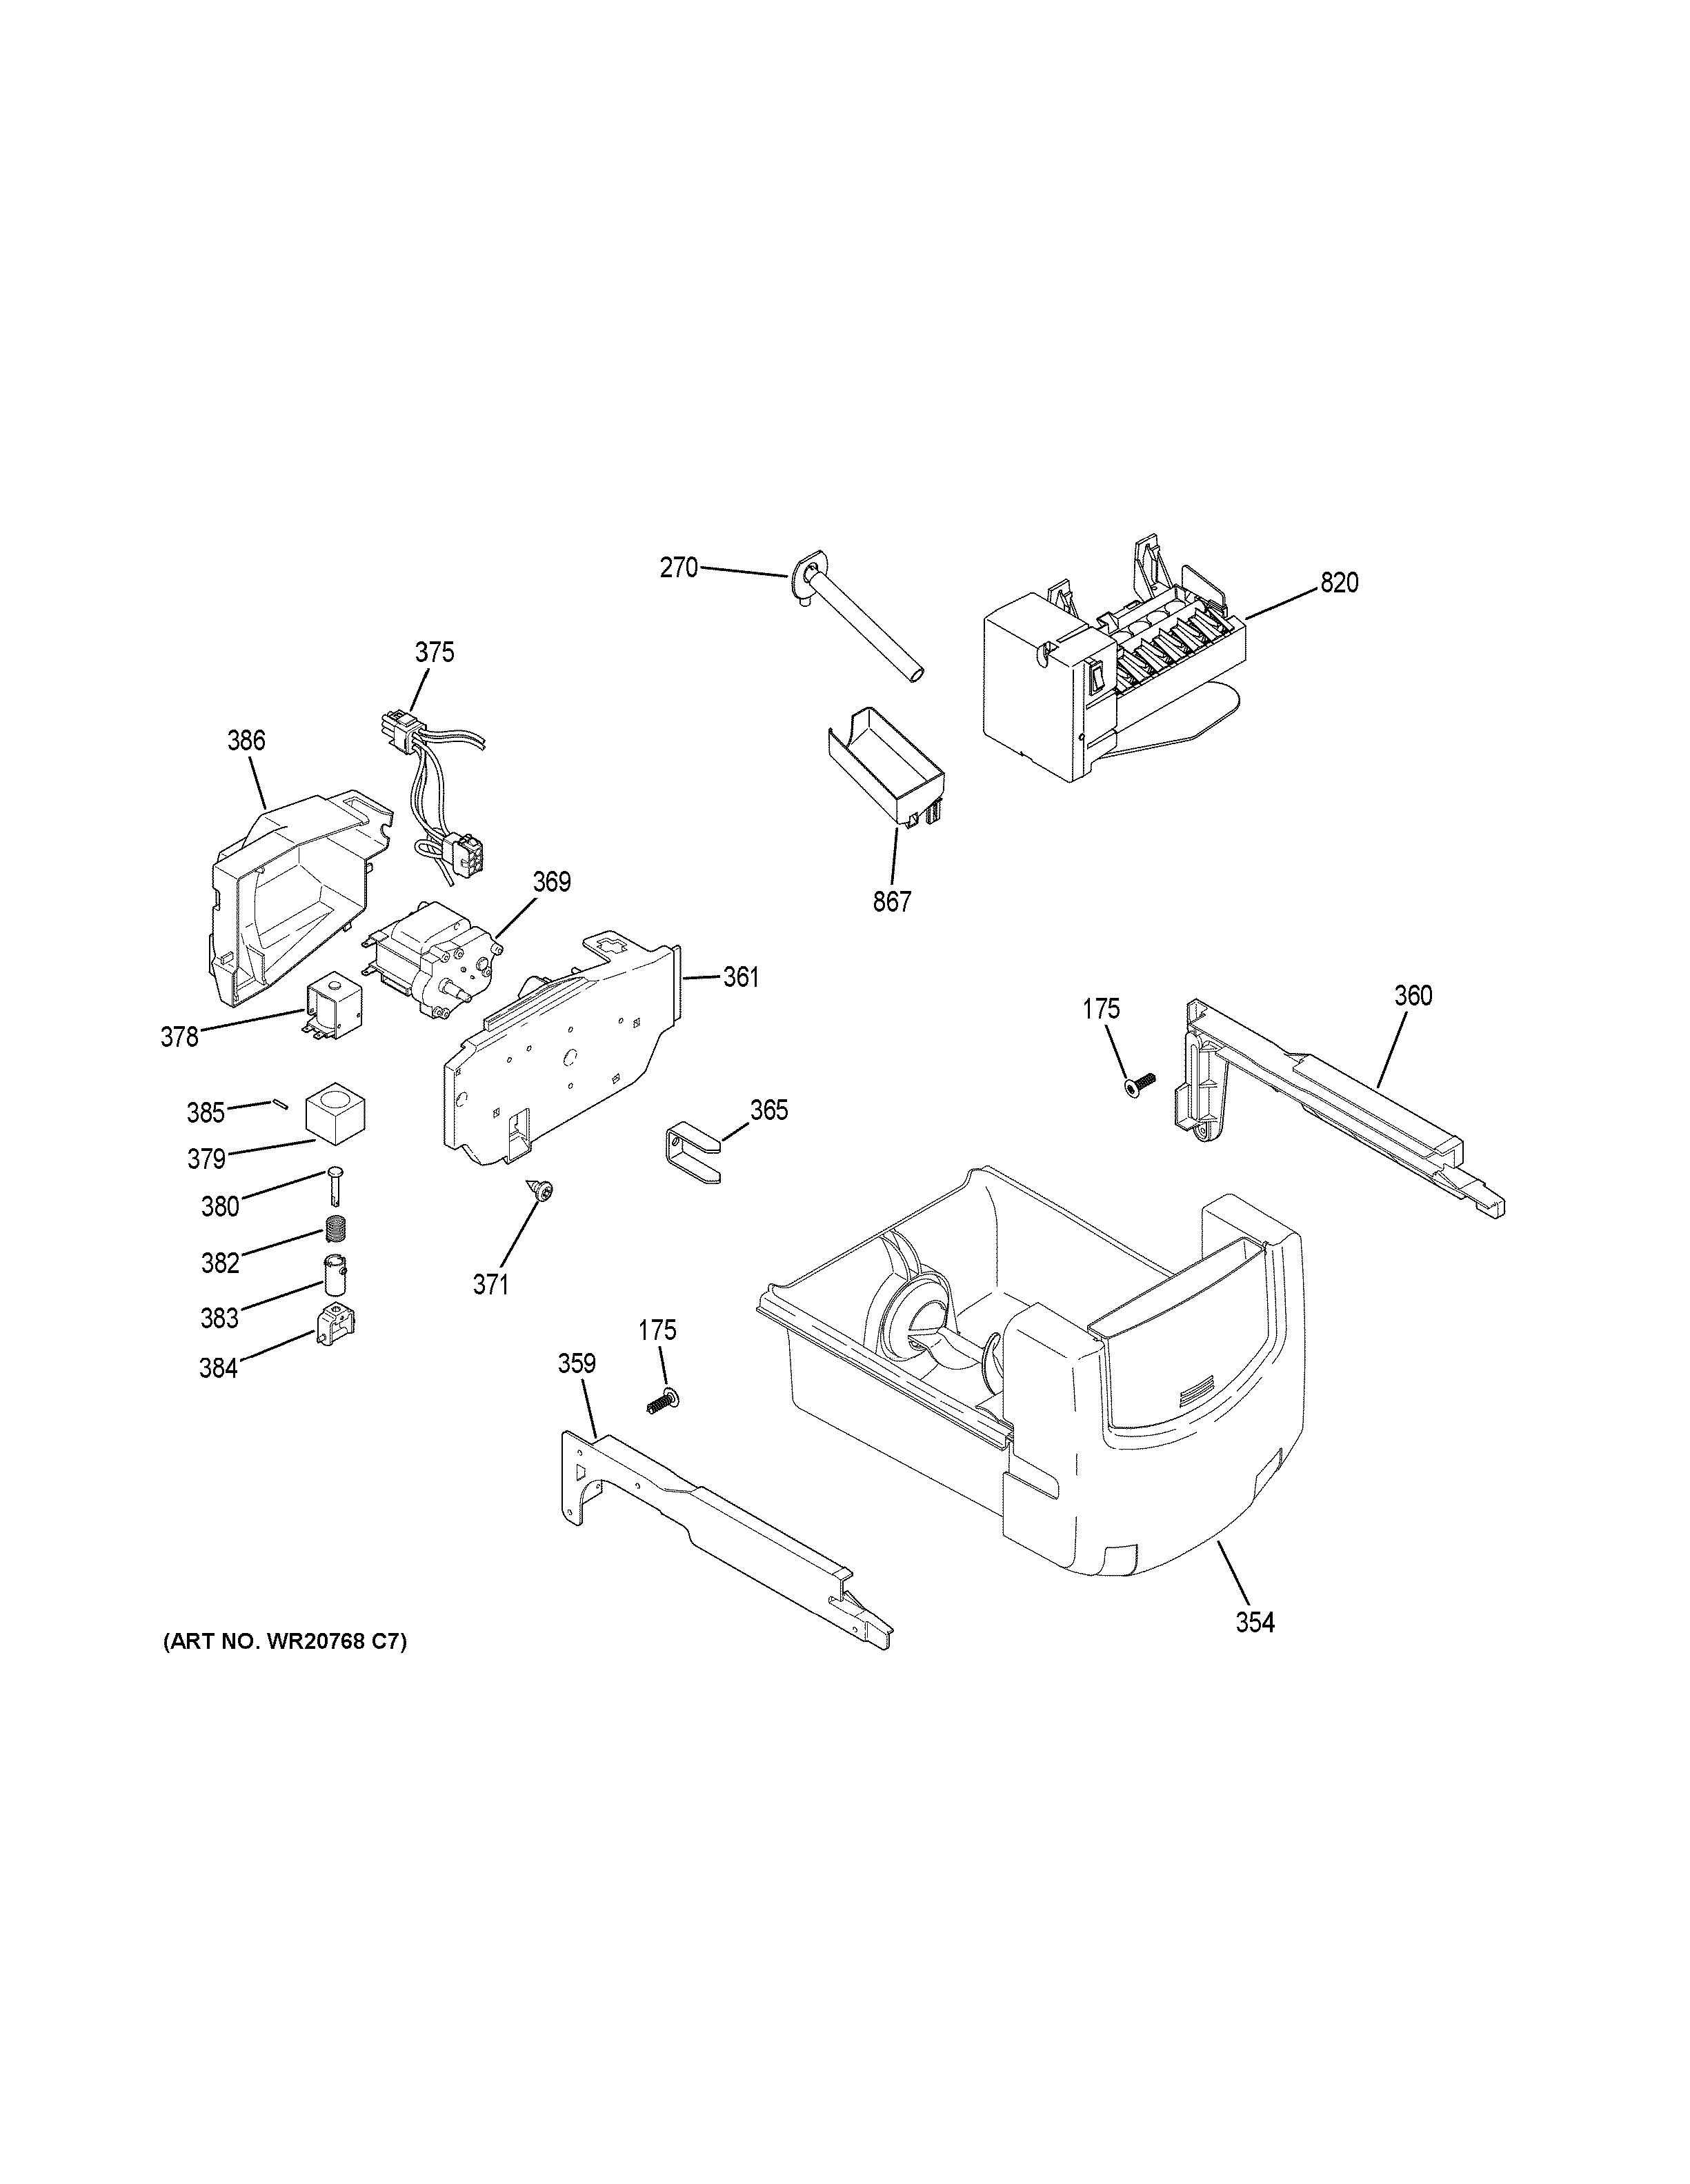 Assembly View For Ice Maker Amp Dispenser